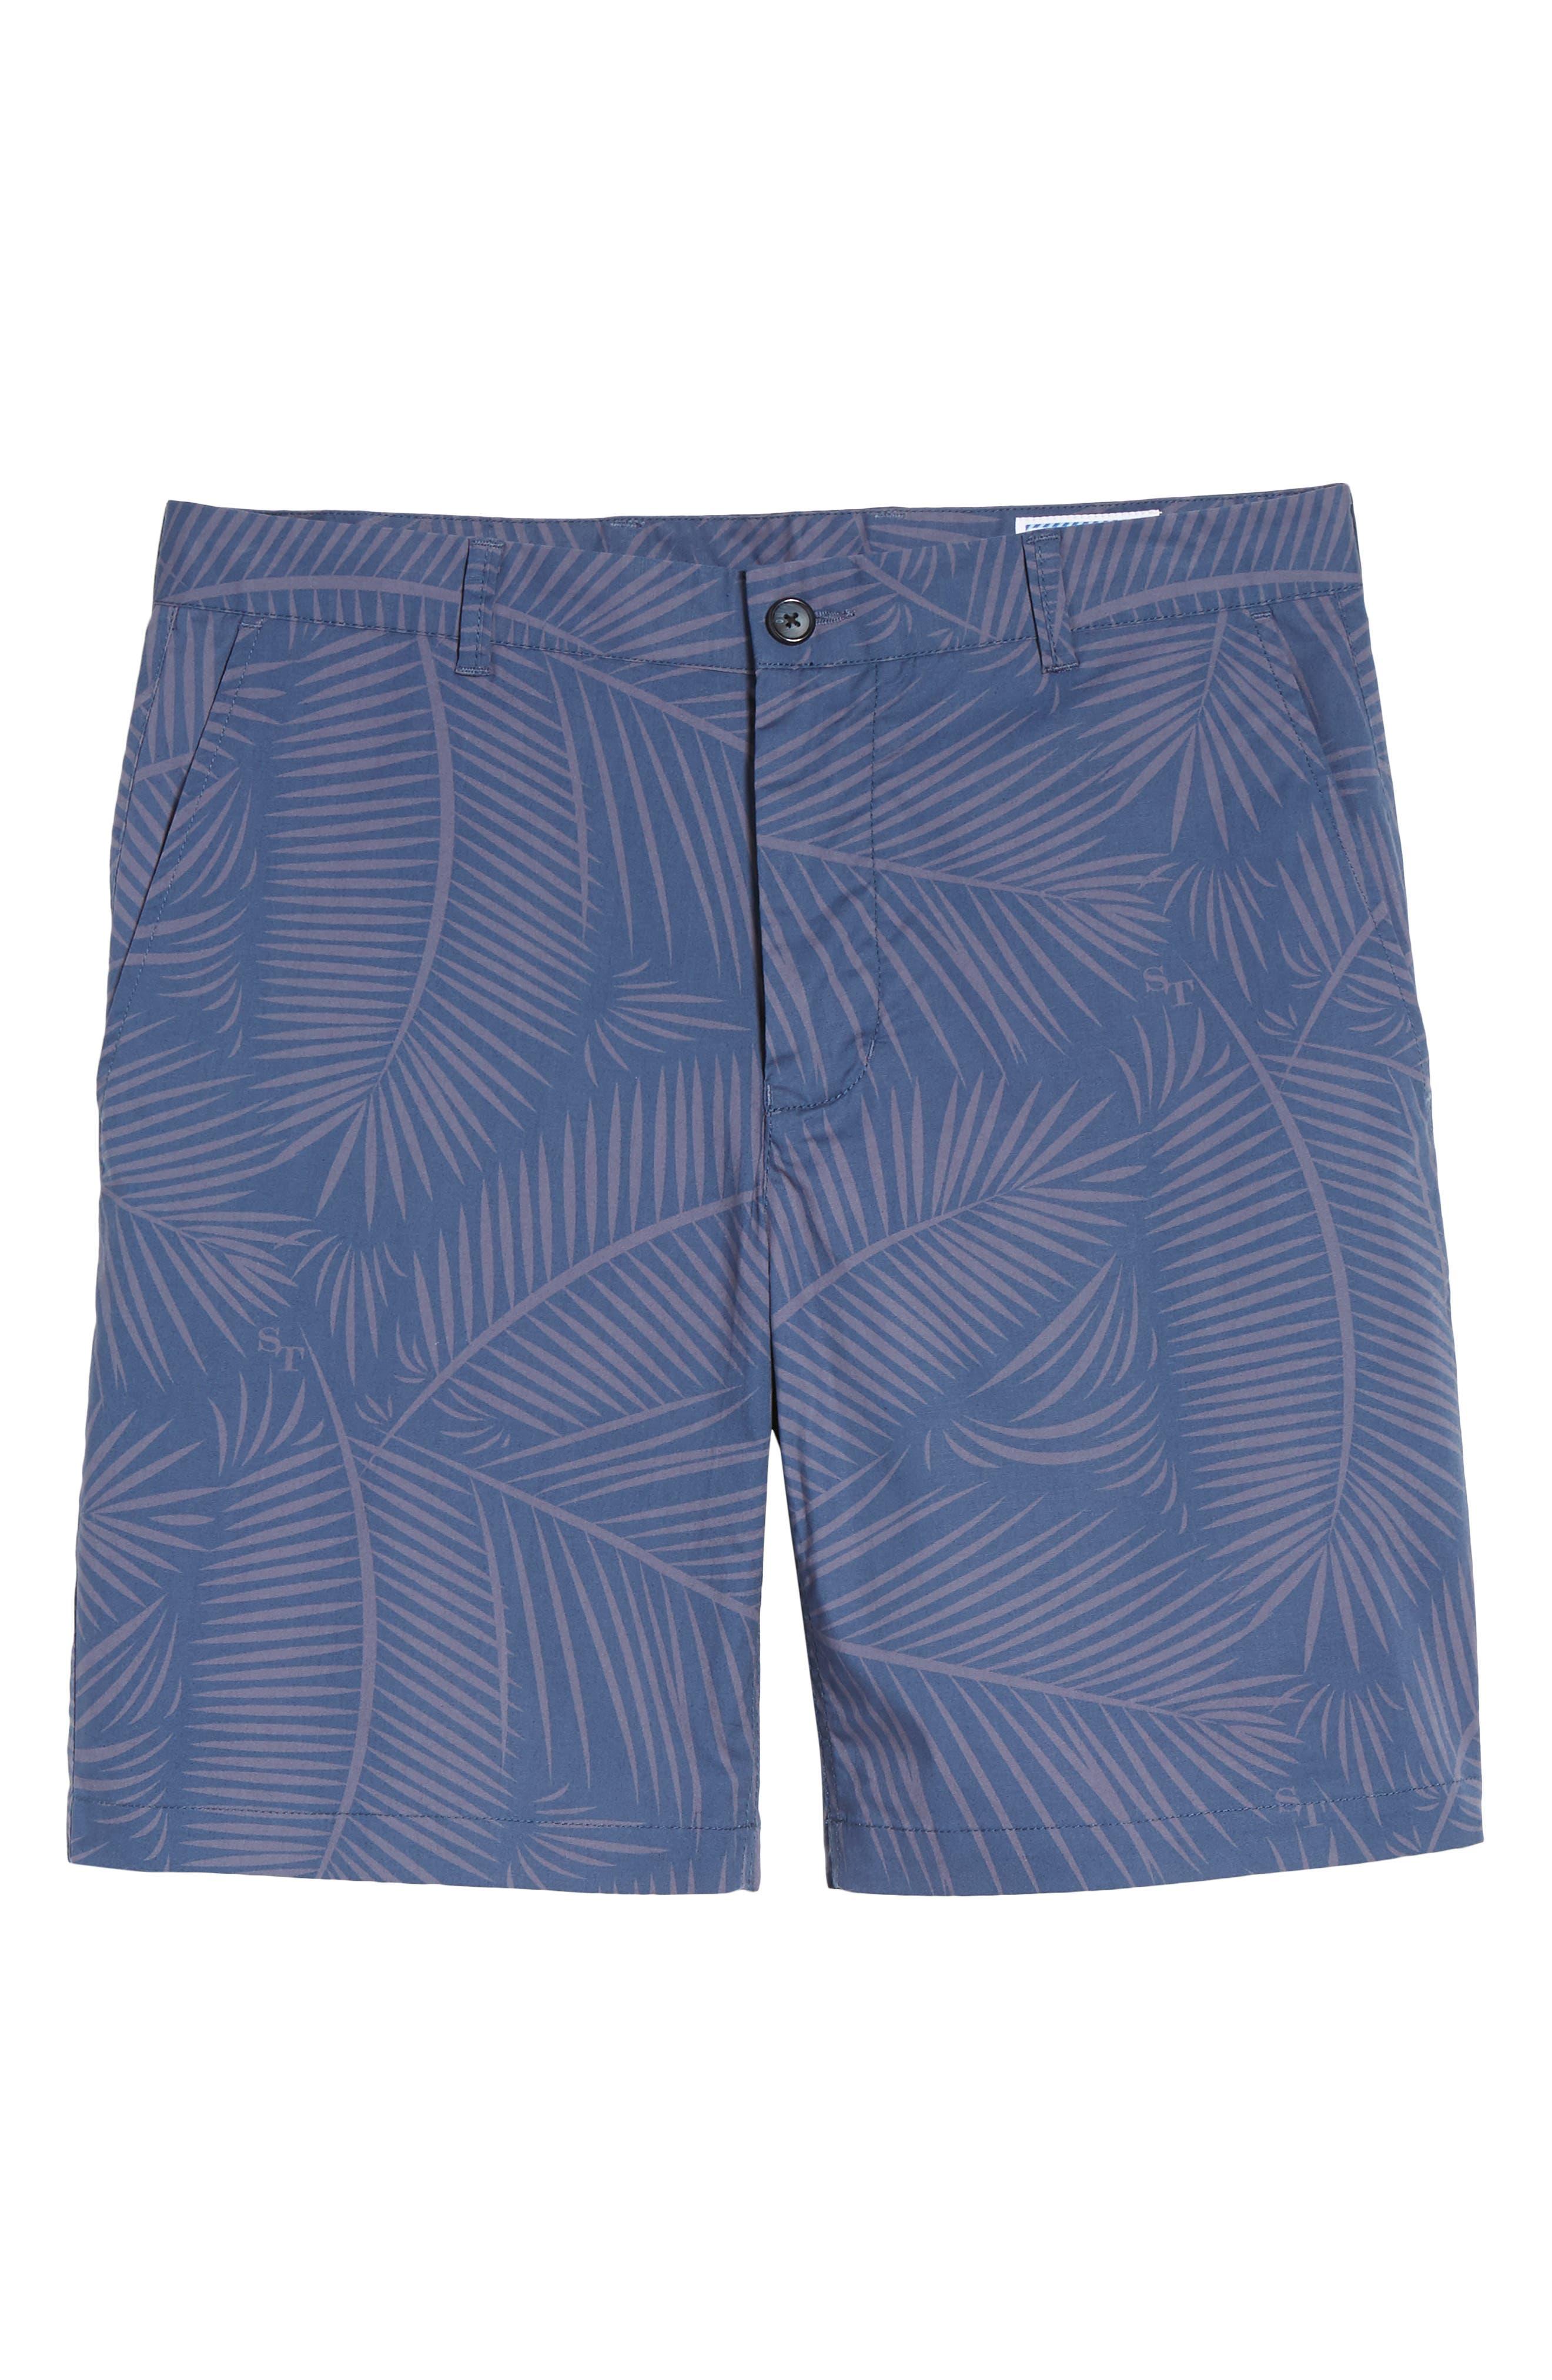 Pelican Peak Shorts,                             Alternate thumbnail 6, color,                             425